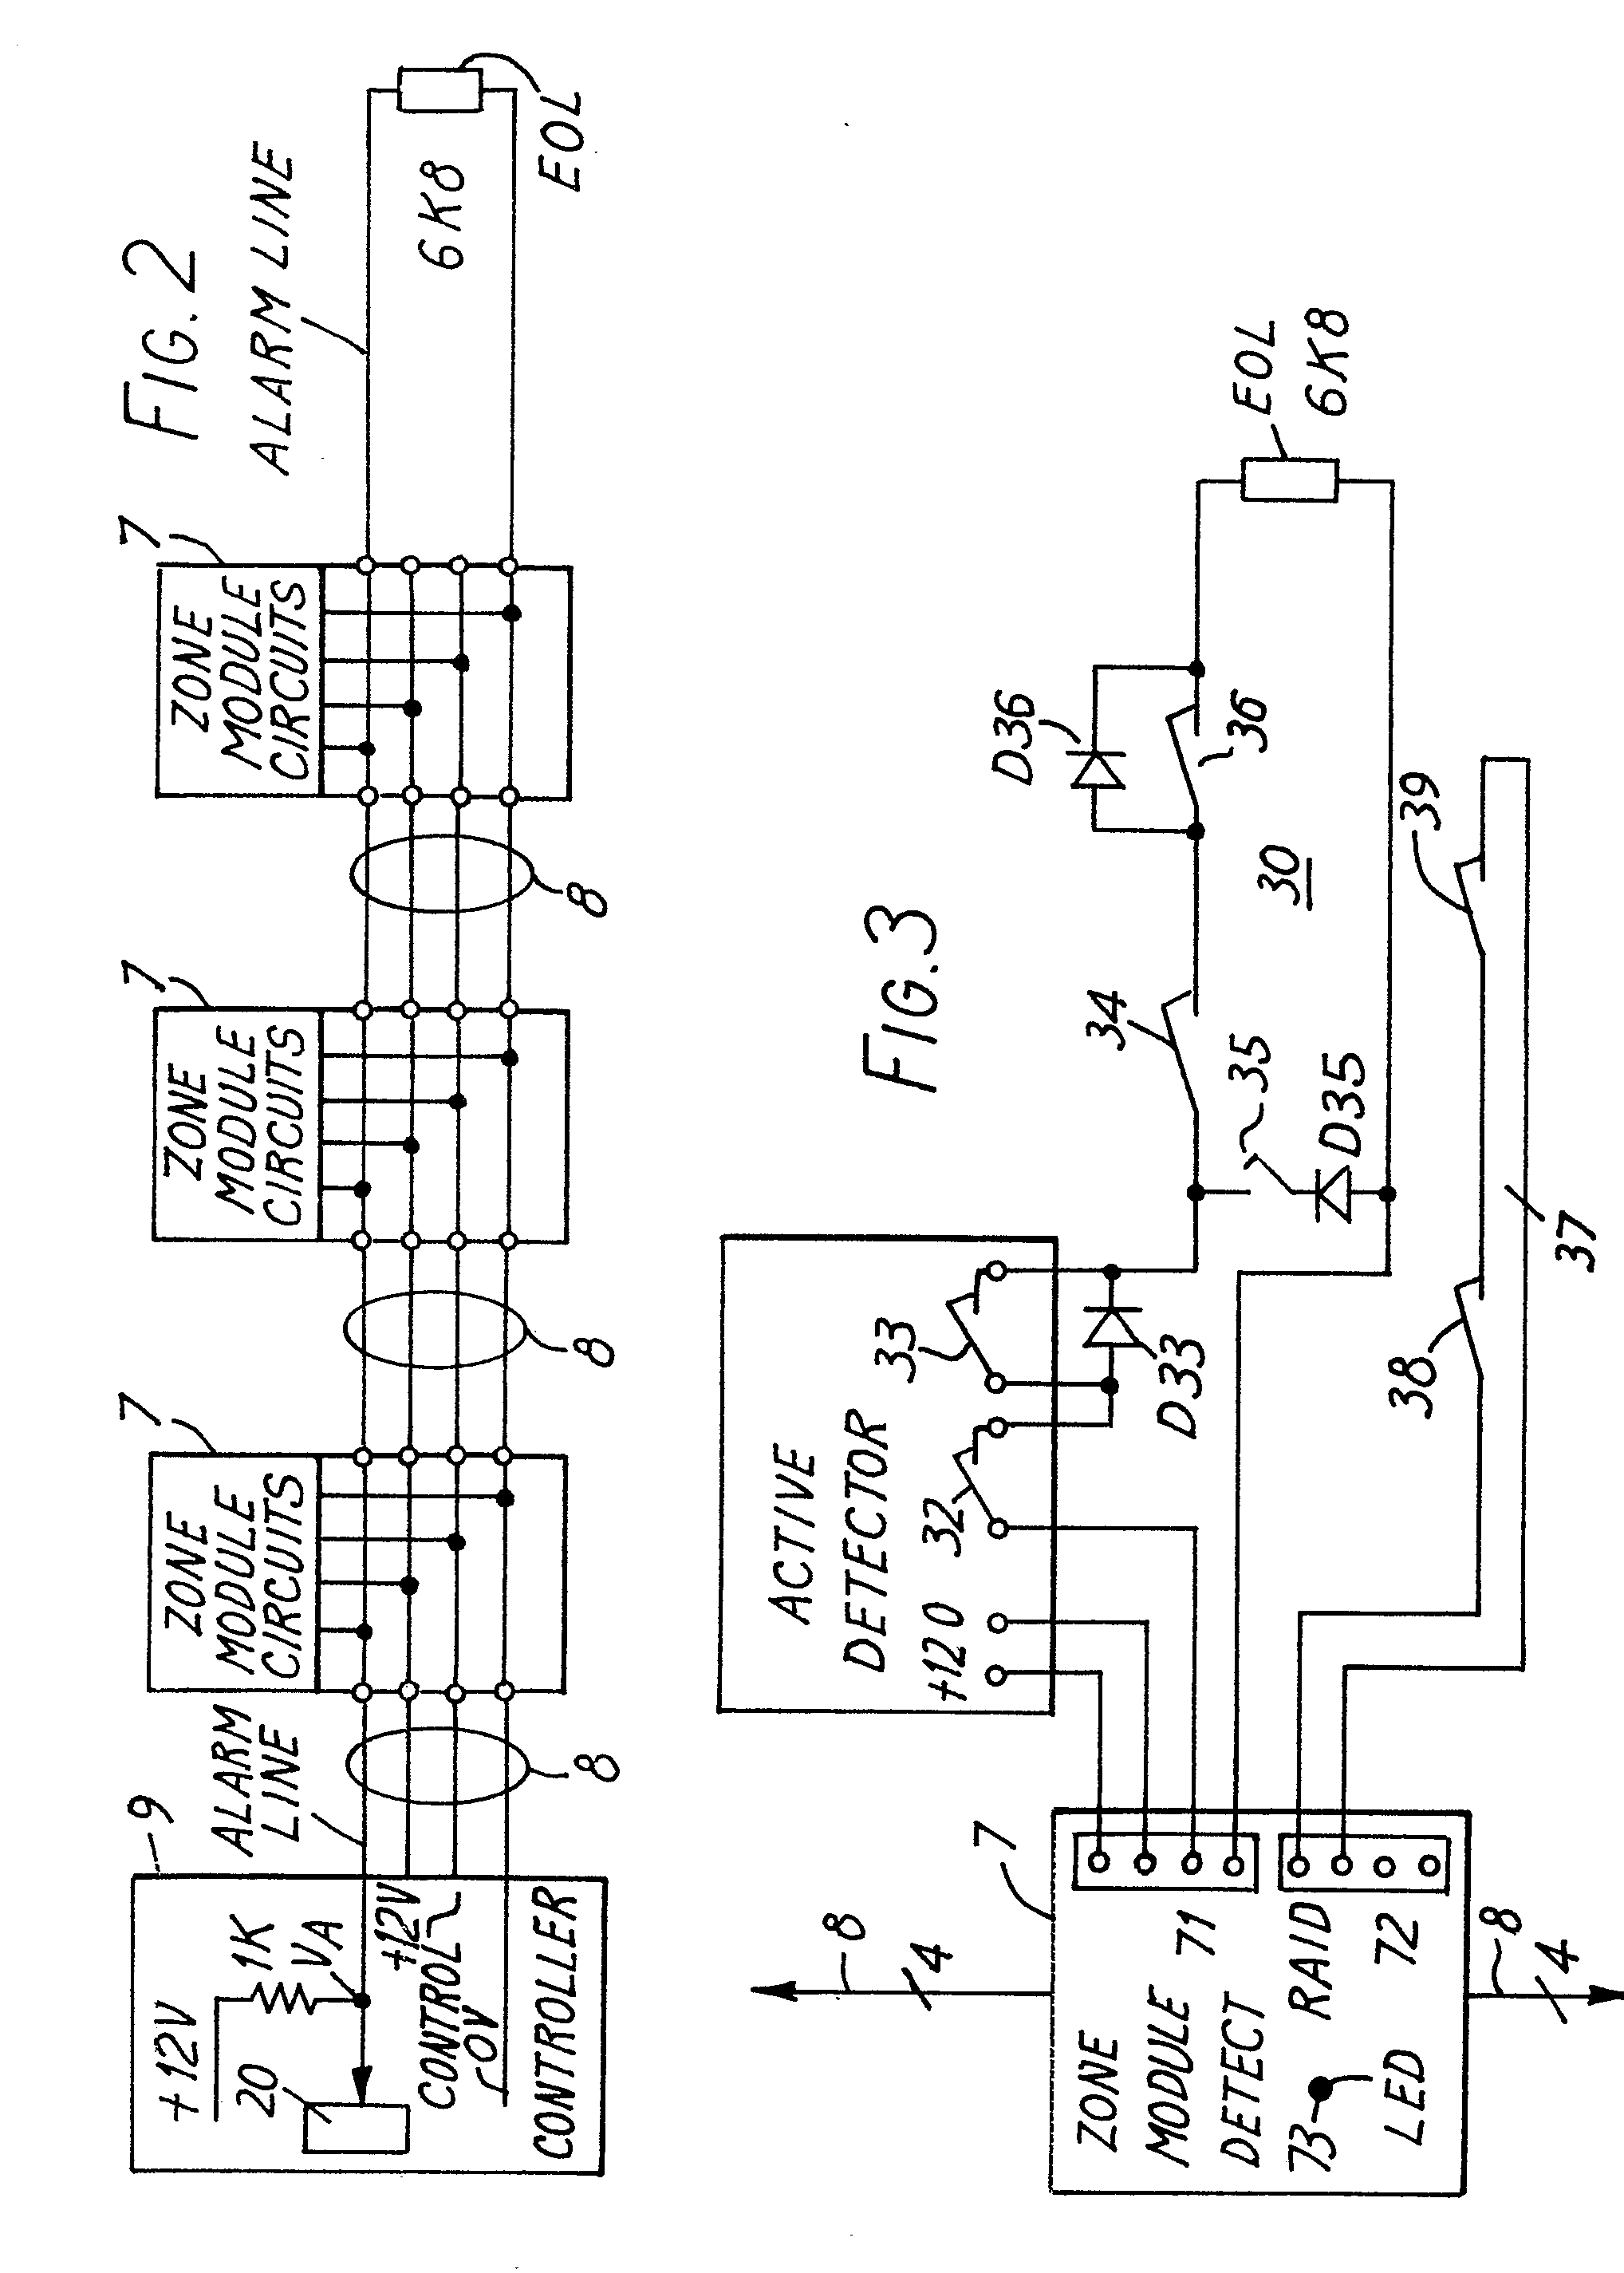 eol resistor wiring diagram land rover wiring harness damage